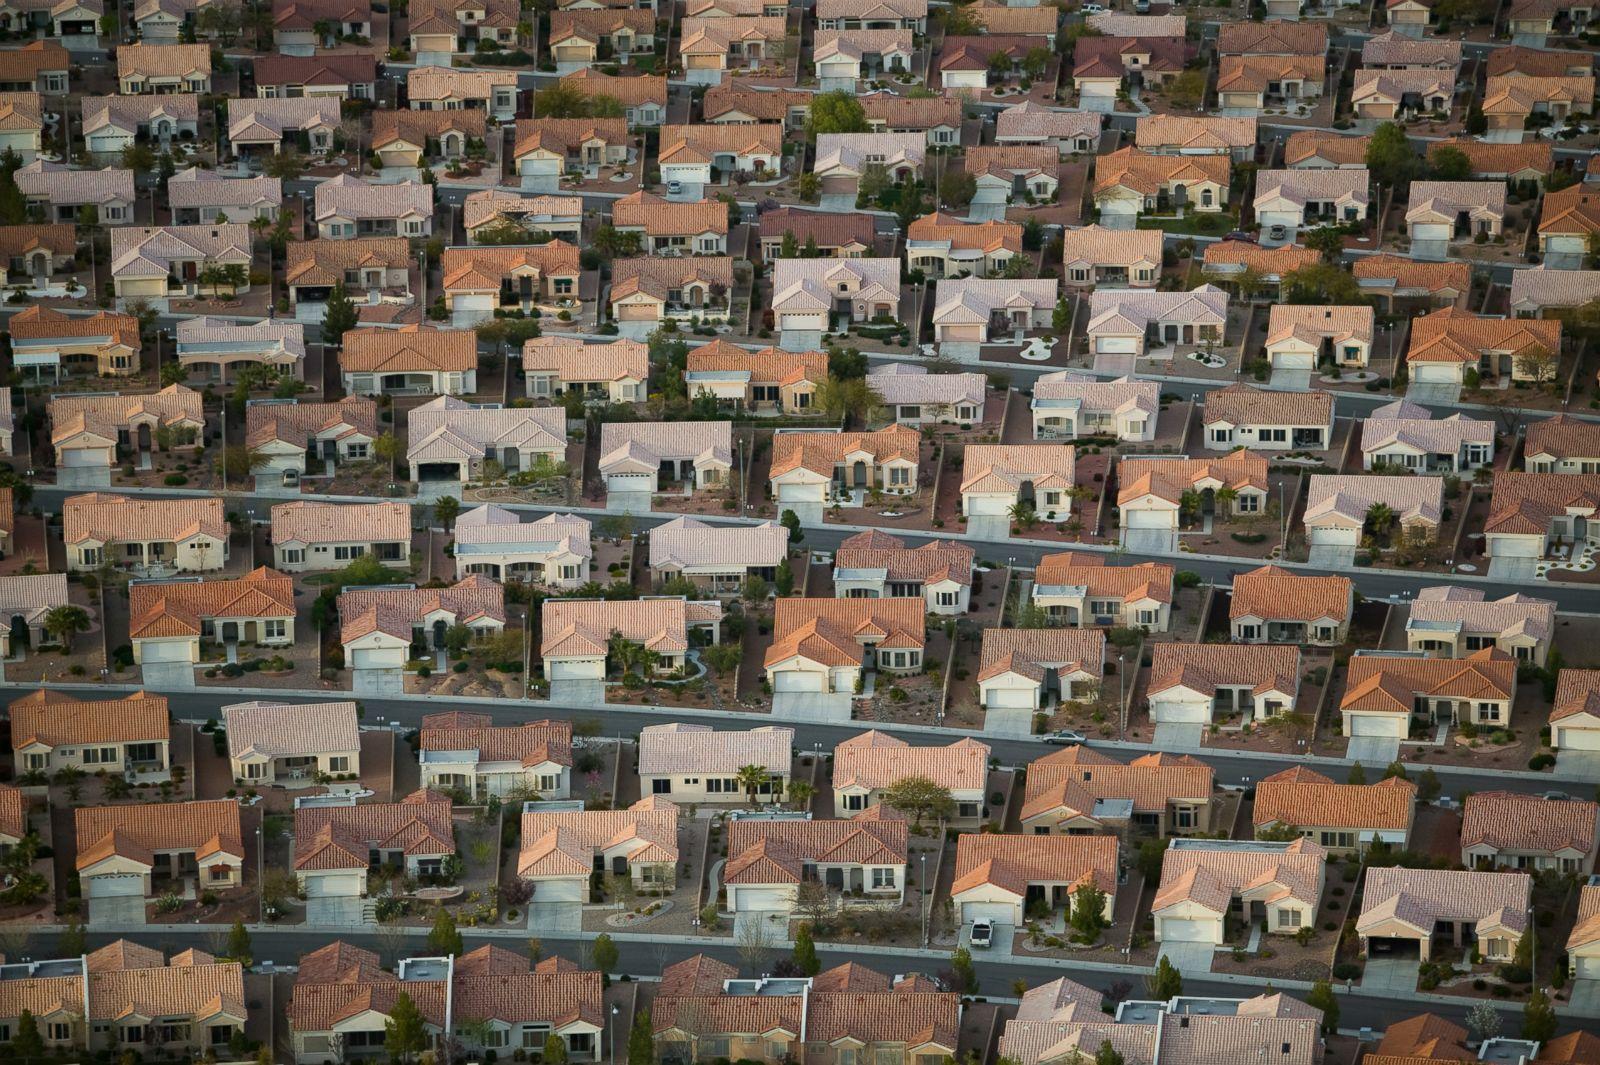 An adobe housing development in Las Vegas, Nevada